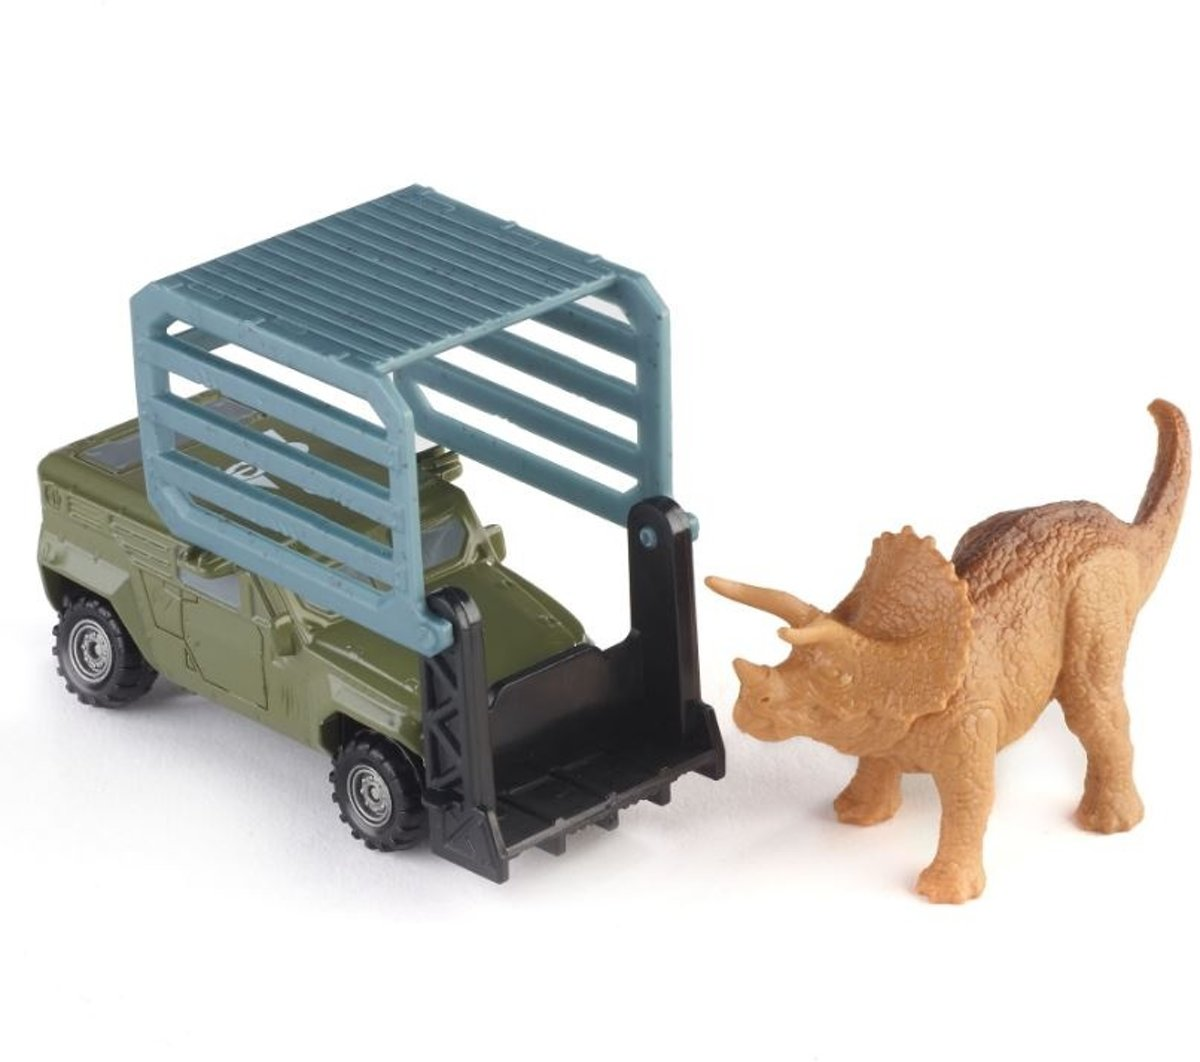 Mattel Jurassic World Dinosaurus Met Truck Bruin, Groen 17cm kopen